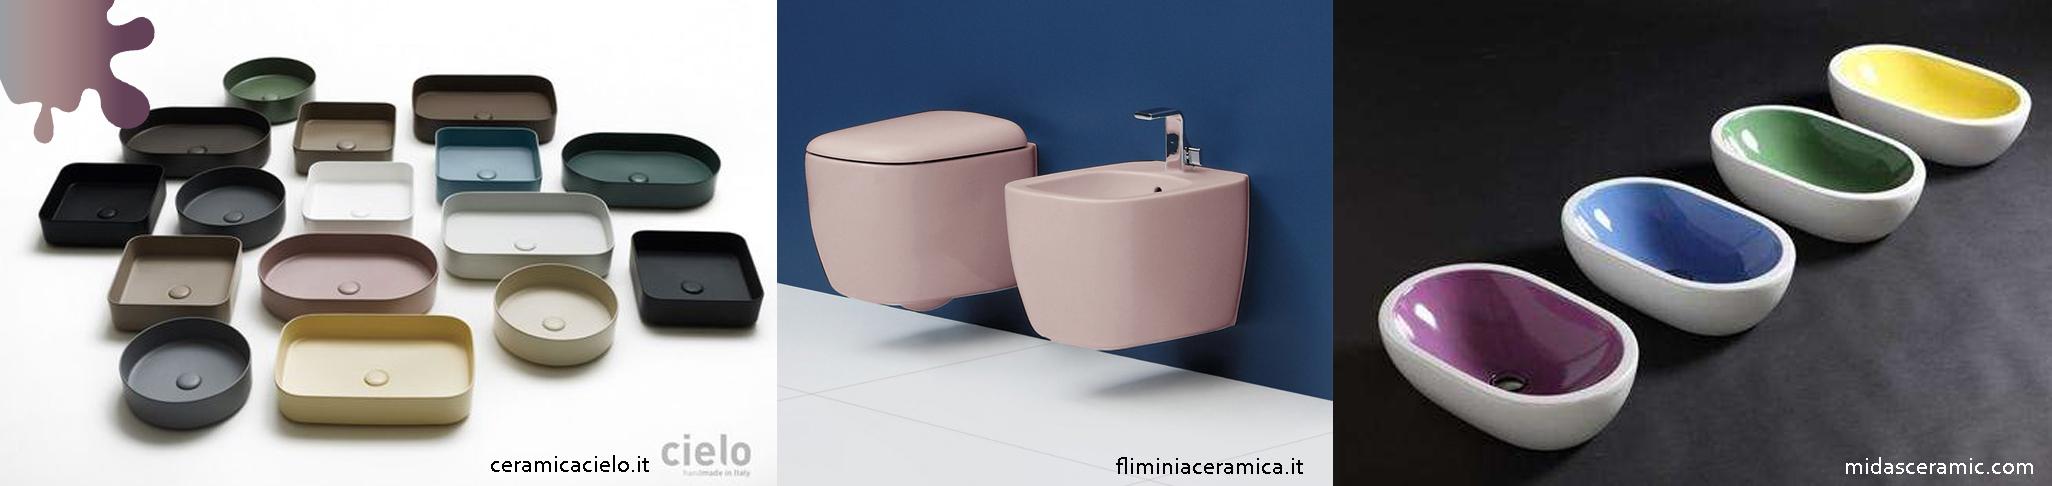 Amenajare-baie_ceramica colorata_sanitare colorate